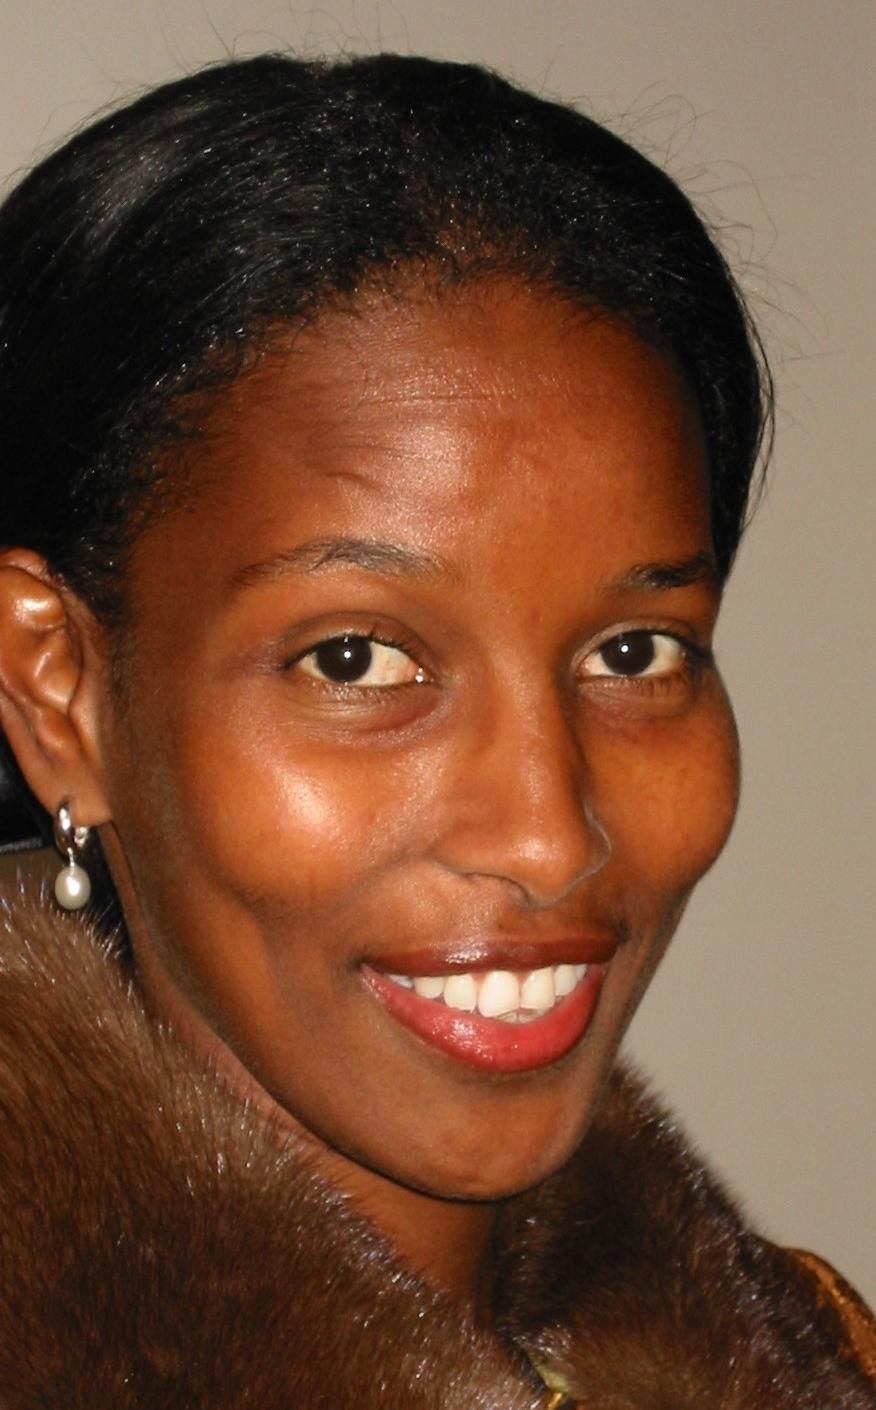 Ayaan Hirsi Ali. Credit: Wikimedia Commons.